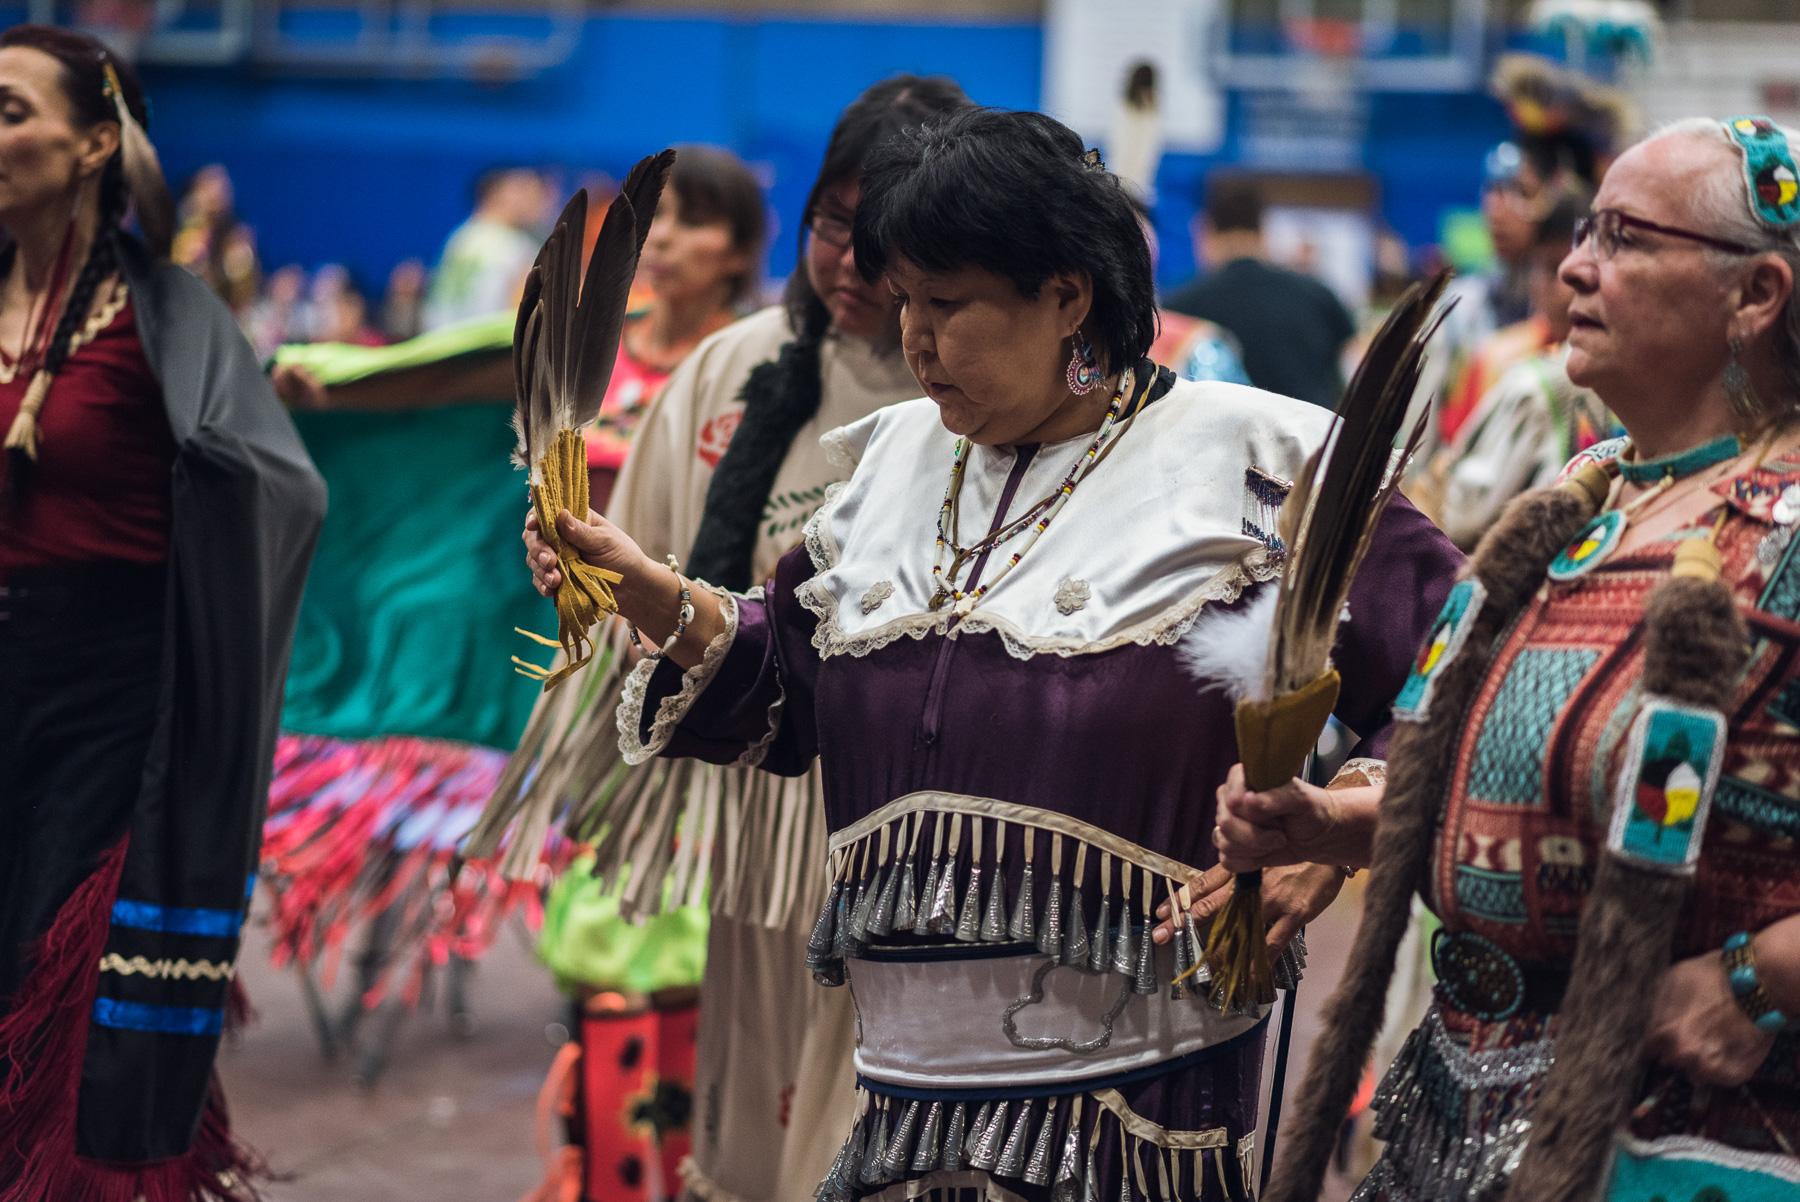 31st-Annual-LUNSA-Powwow-Blog-55.jpg